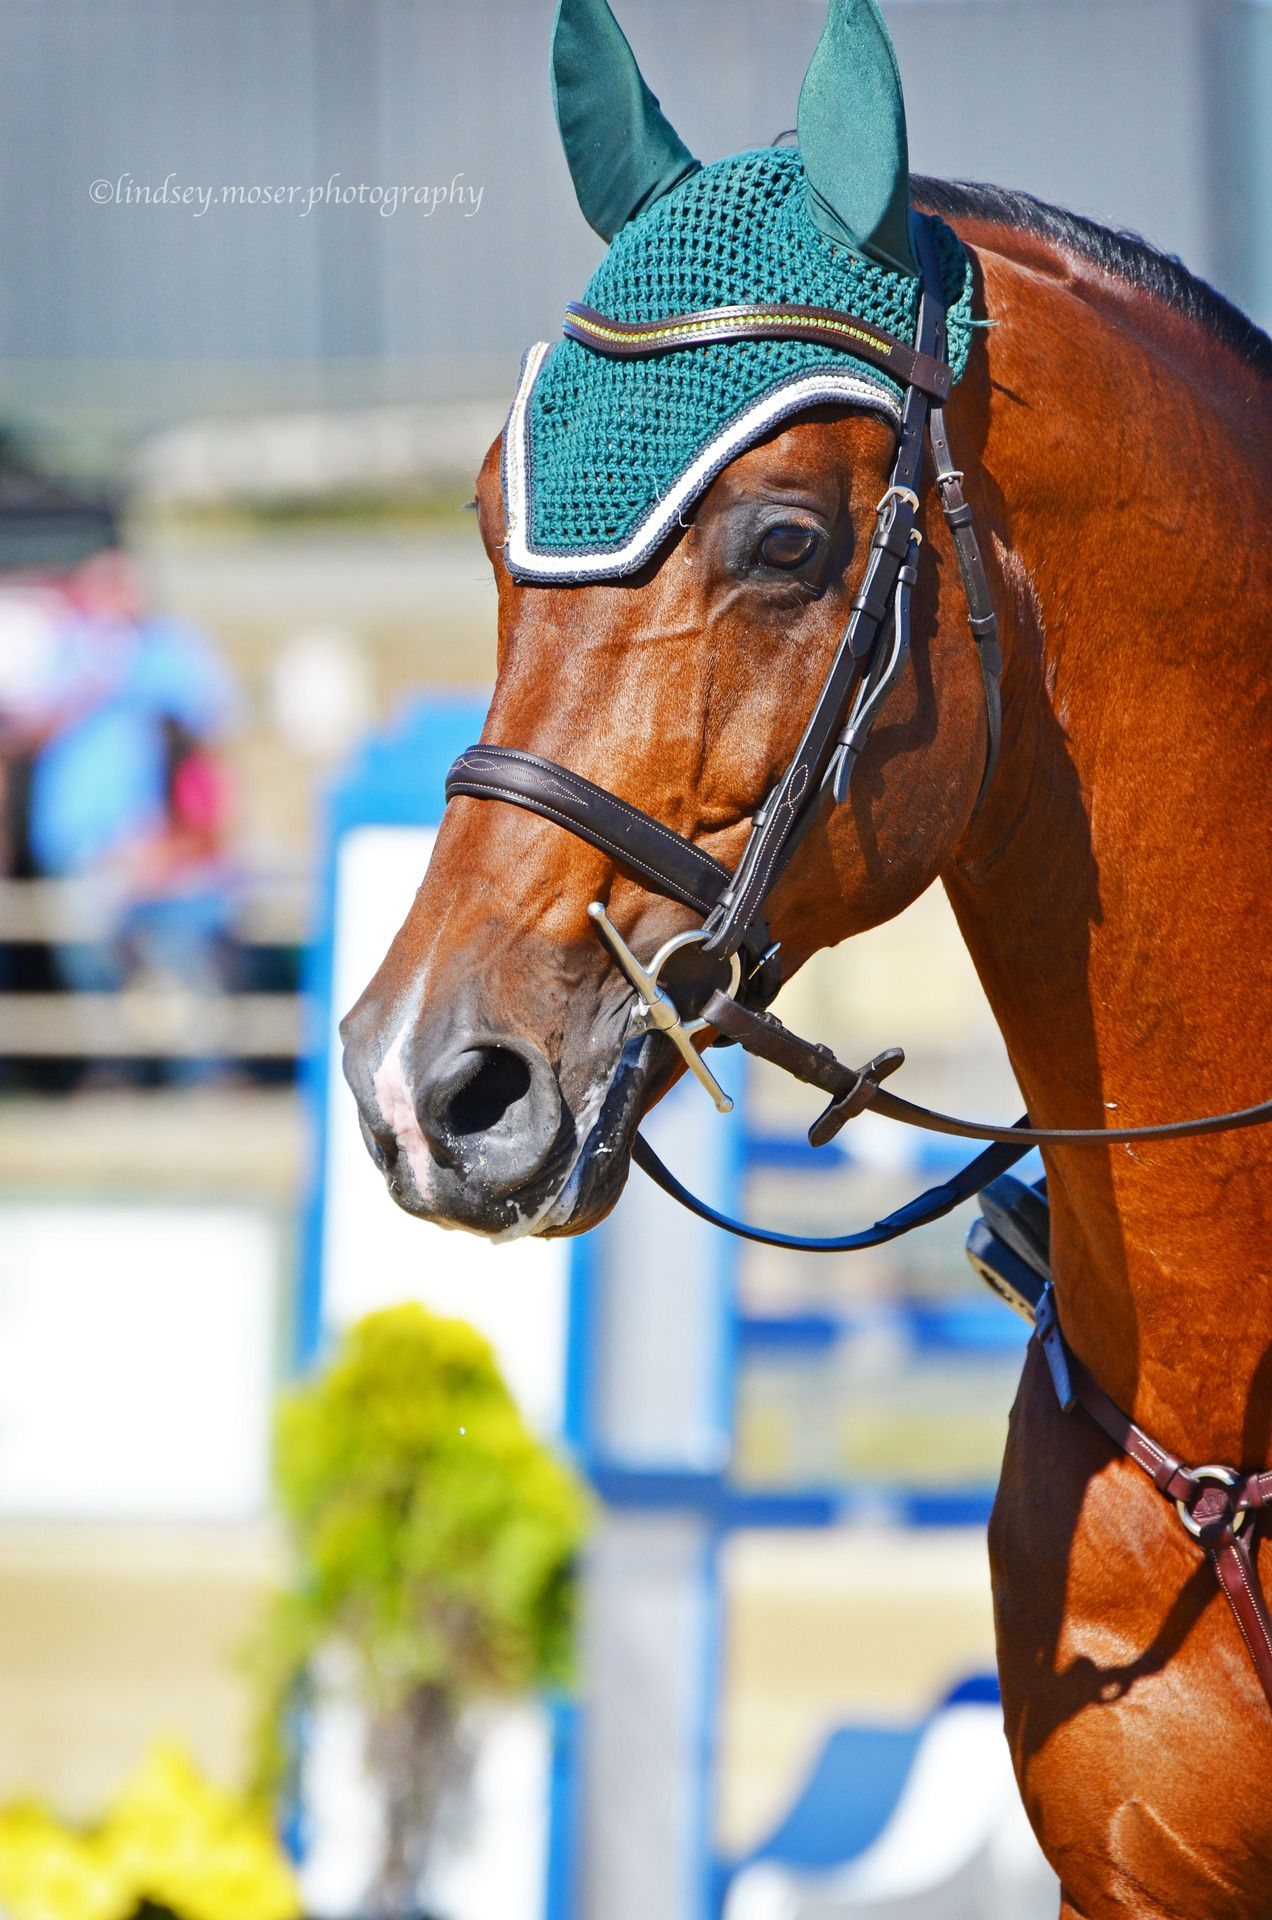 #Hunter #jumper #Salto #equine #grandprix #Orejeras #Adiestramiento #Dressage #bonnet #equestrian #ecuestre #black #blue #azul #negro #cavalo #caballo #horses #Kisakiclub